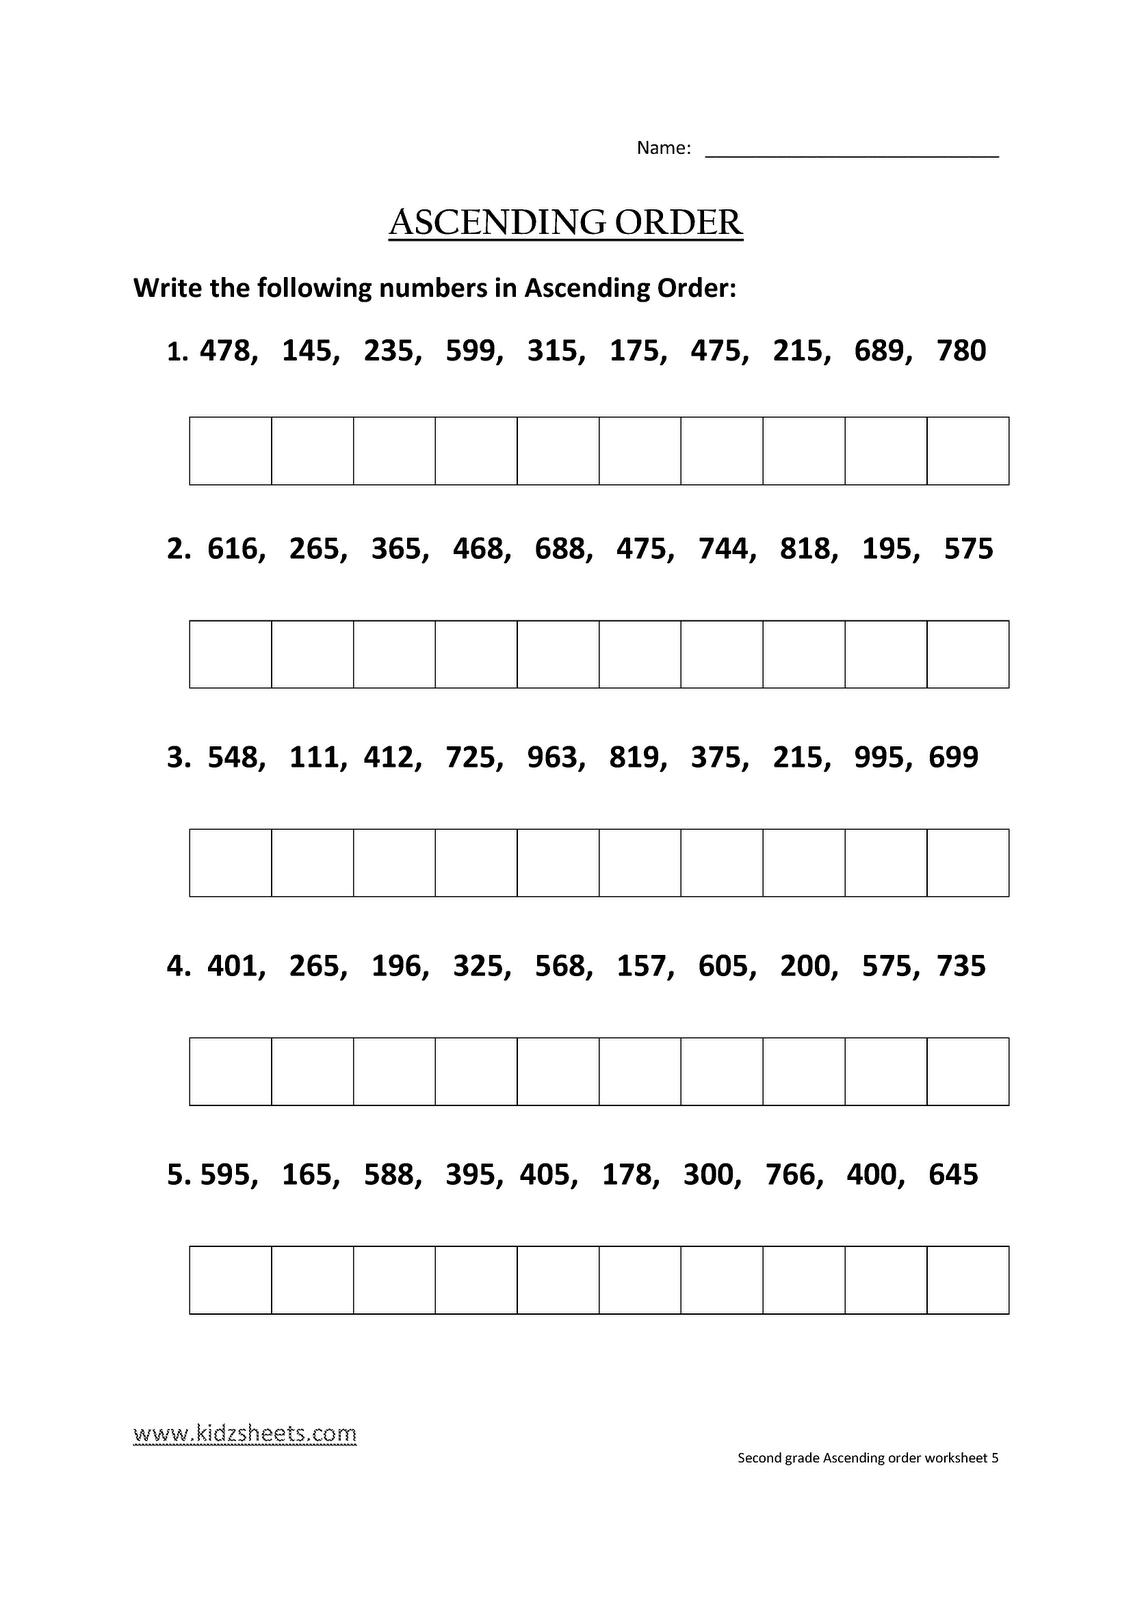 medium resolution of Kindergarten Math Ascending Order Worksheets - Preschool Worksheet Gallery